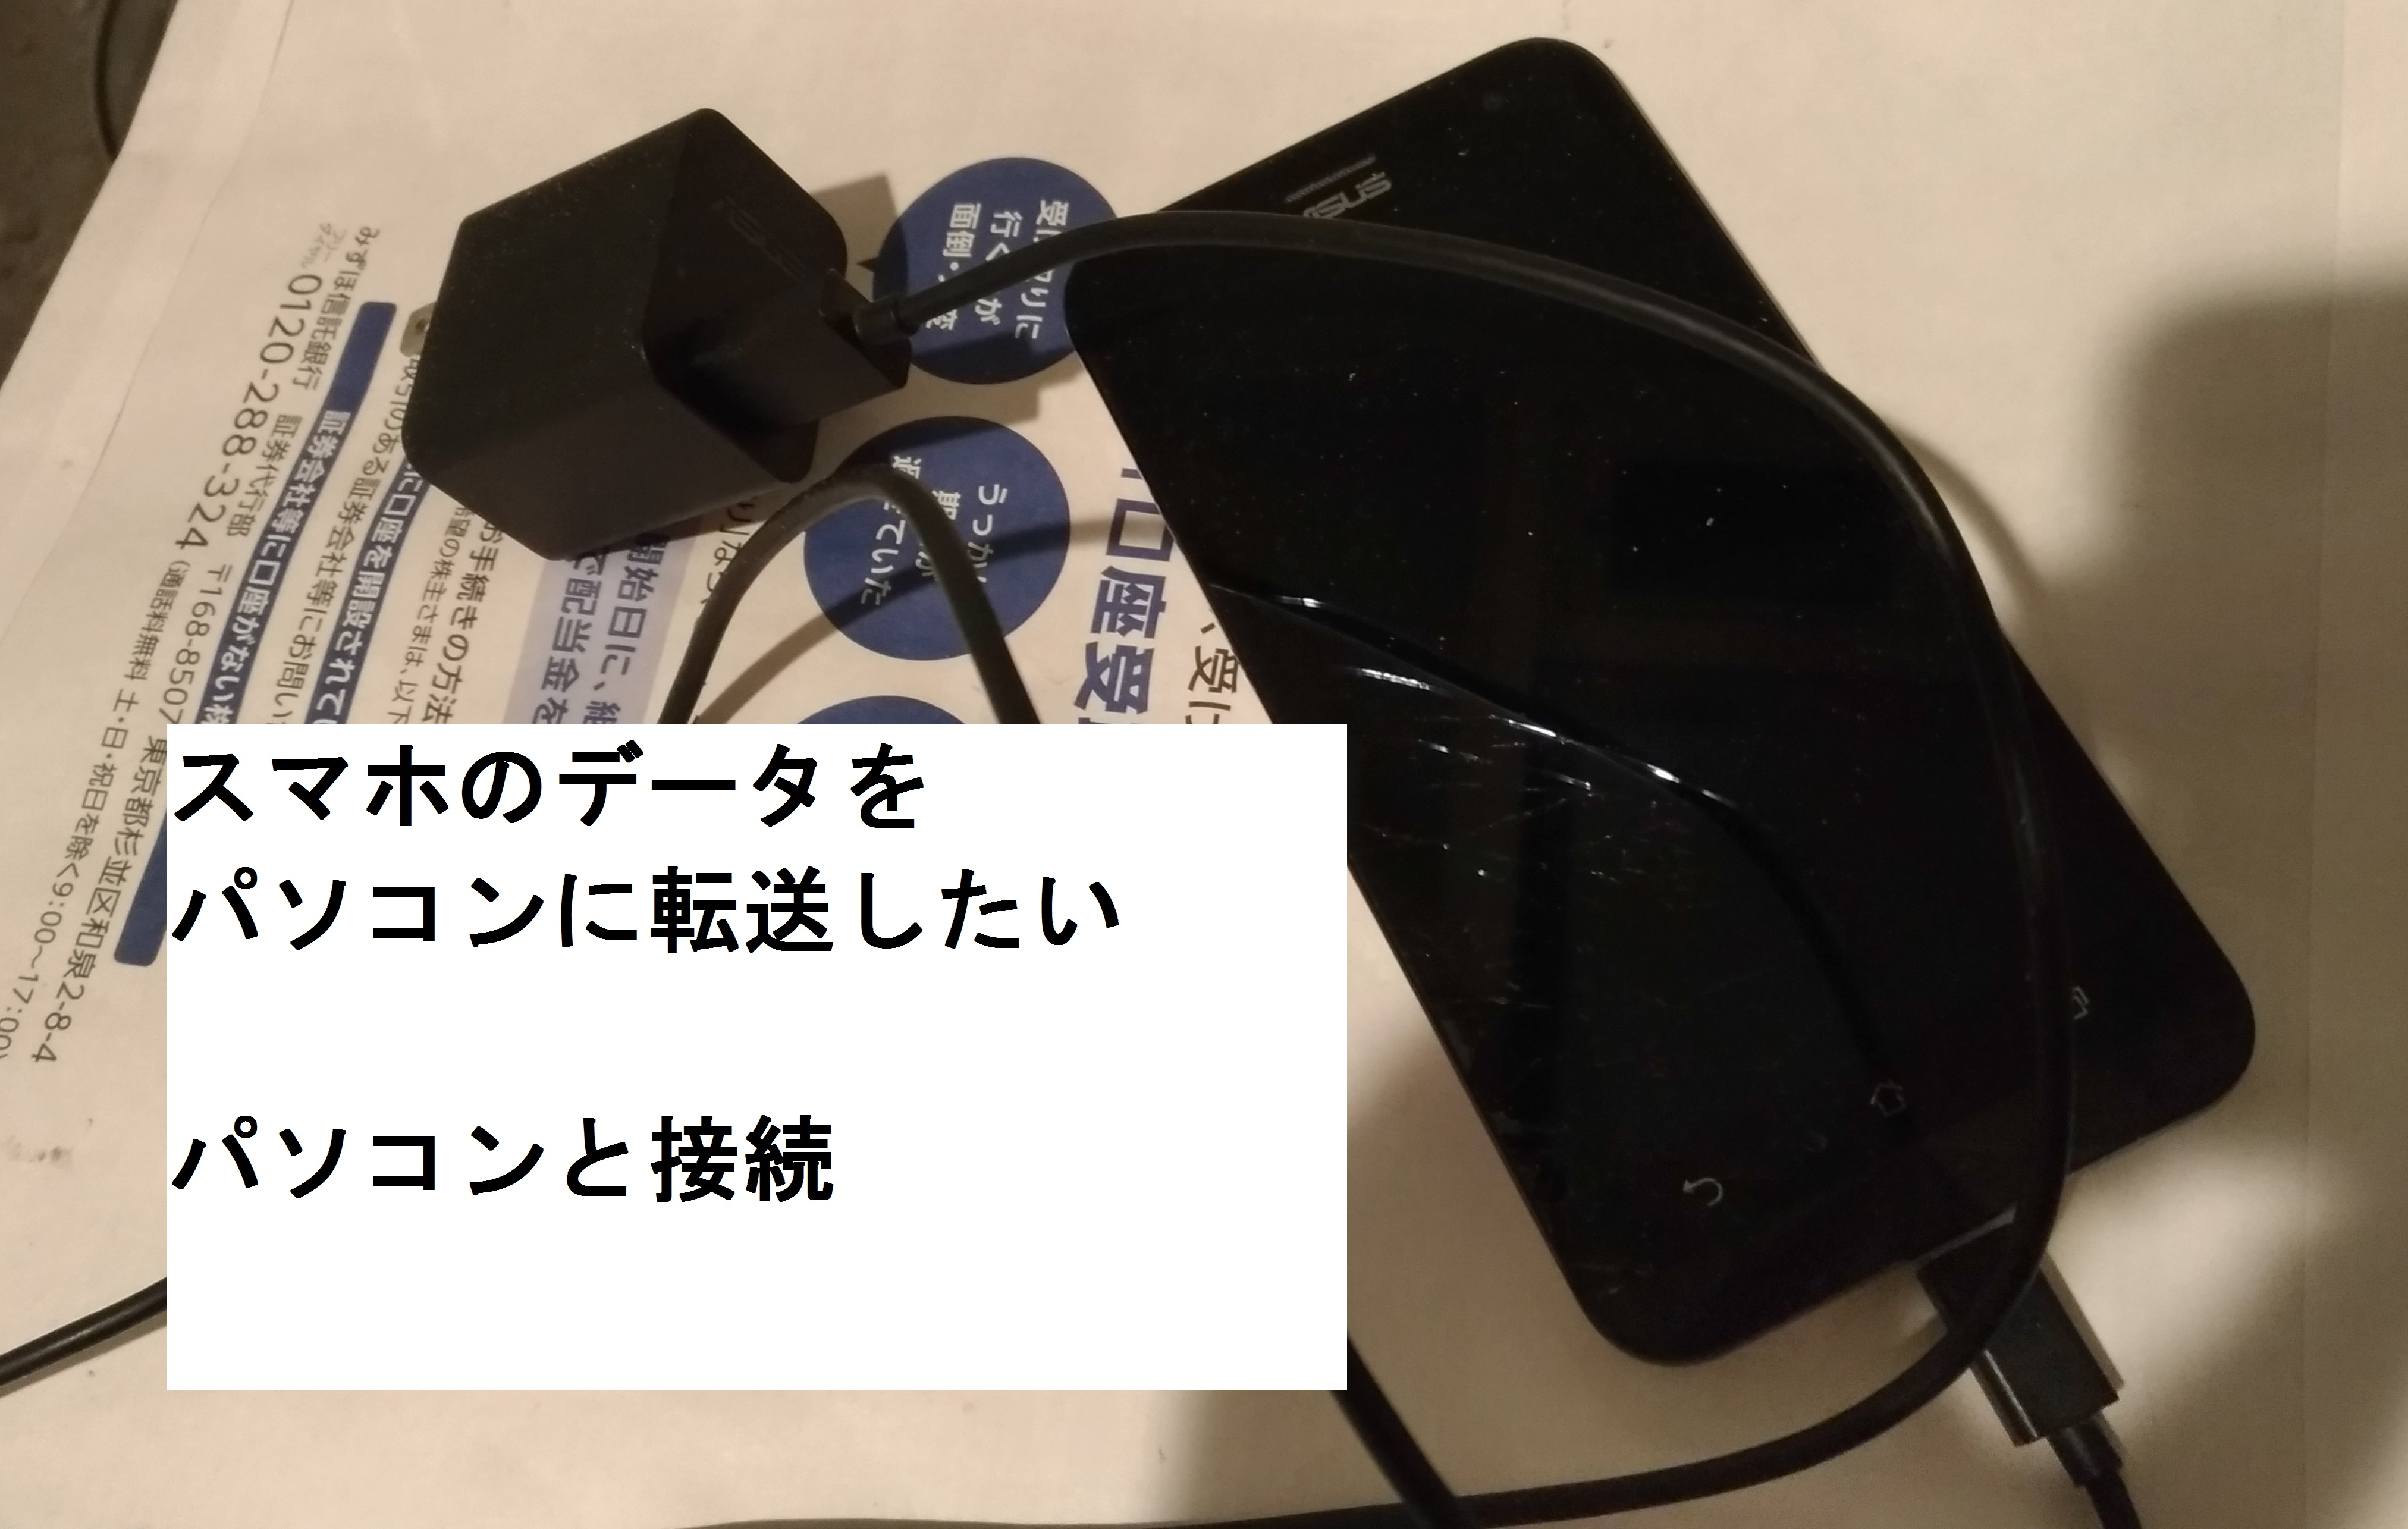 sumaho_pasokon_android.jpg